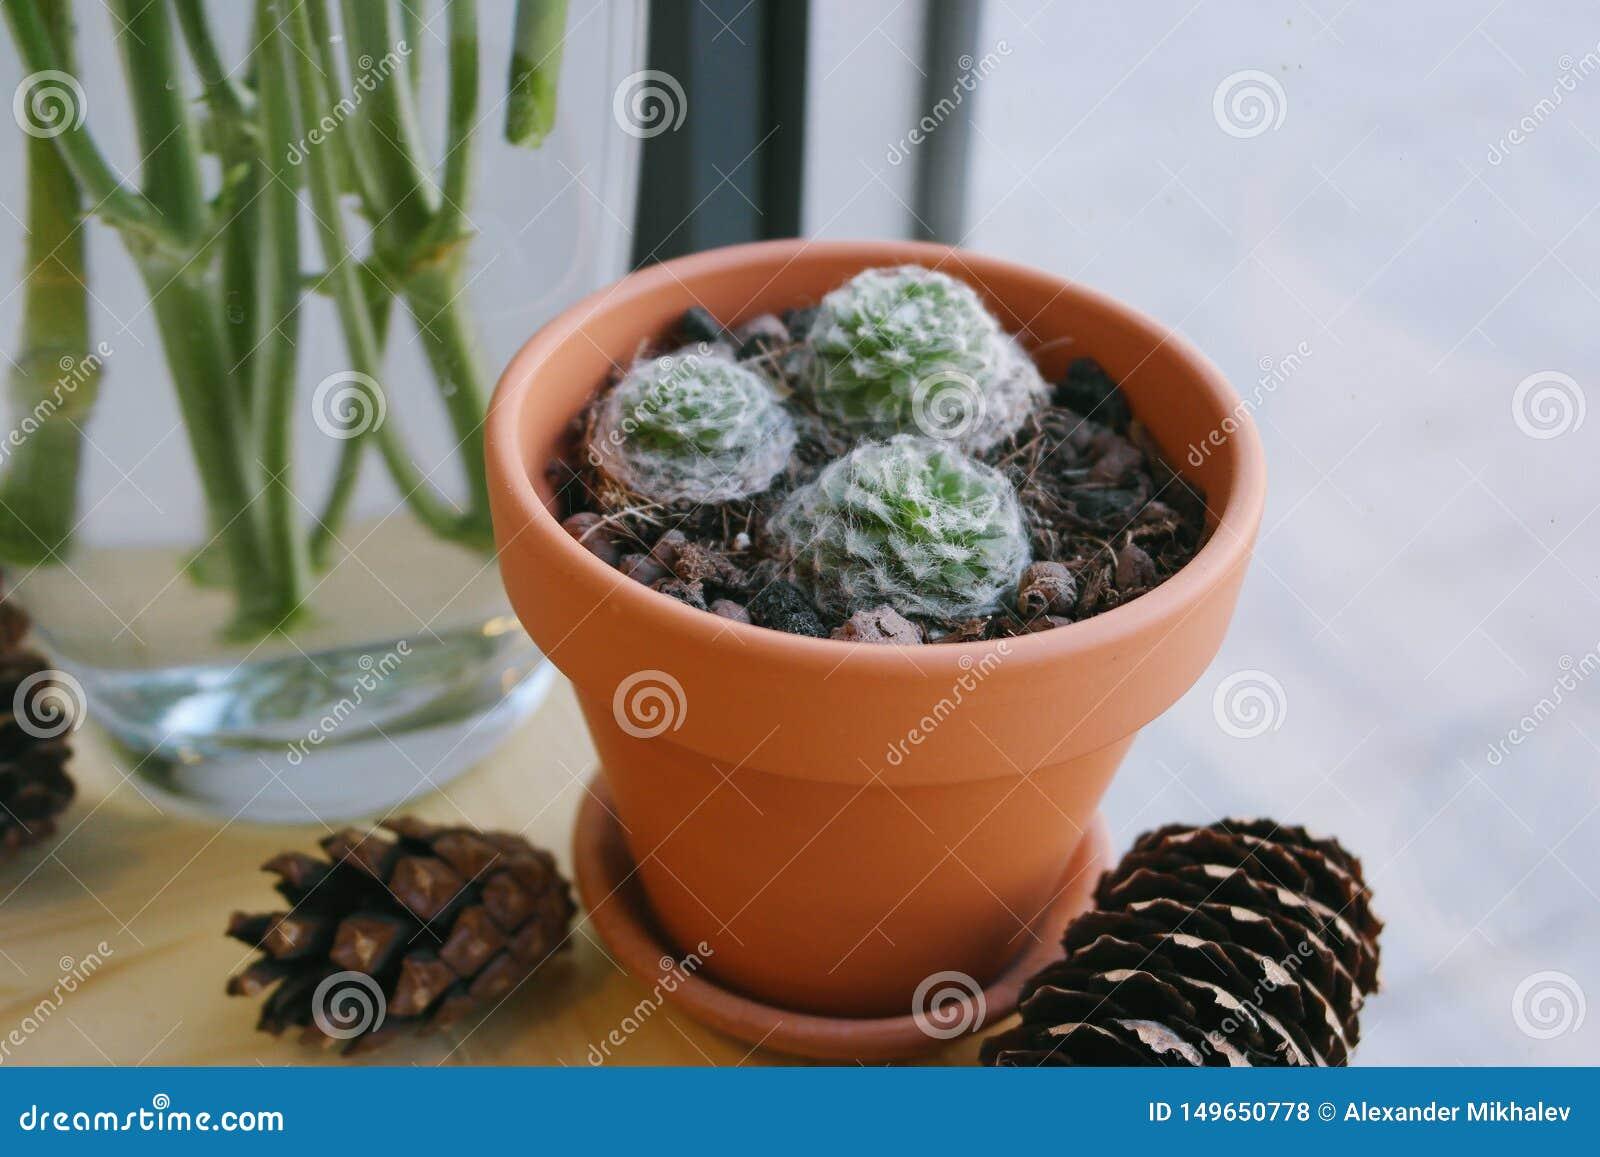 Plant cactus in a pot